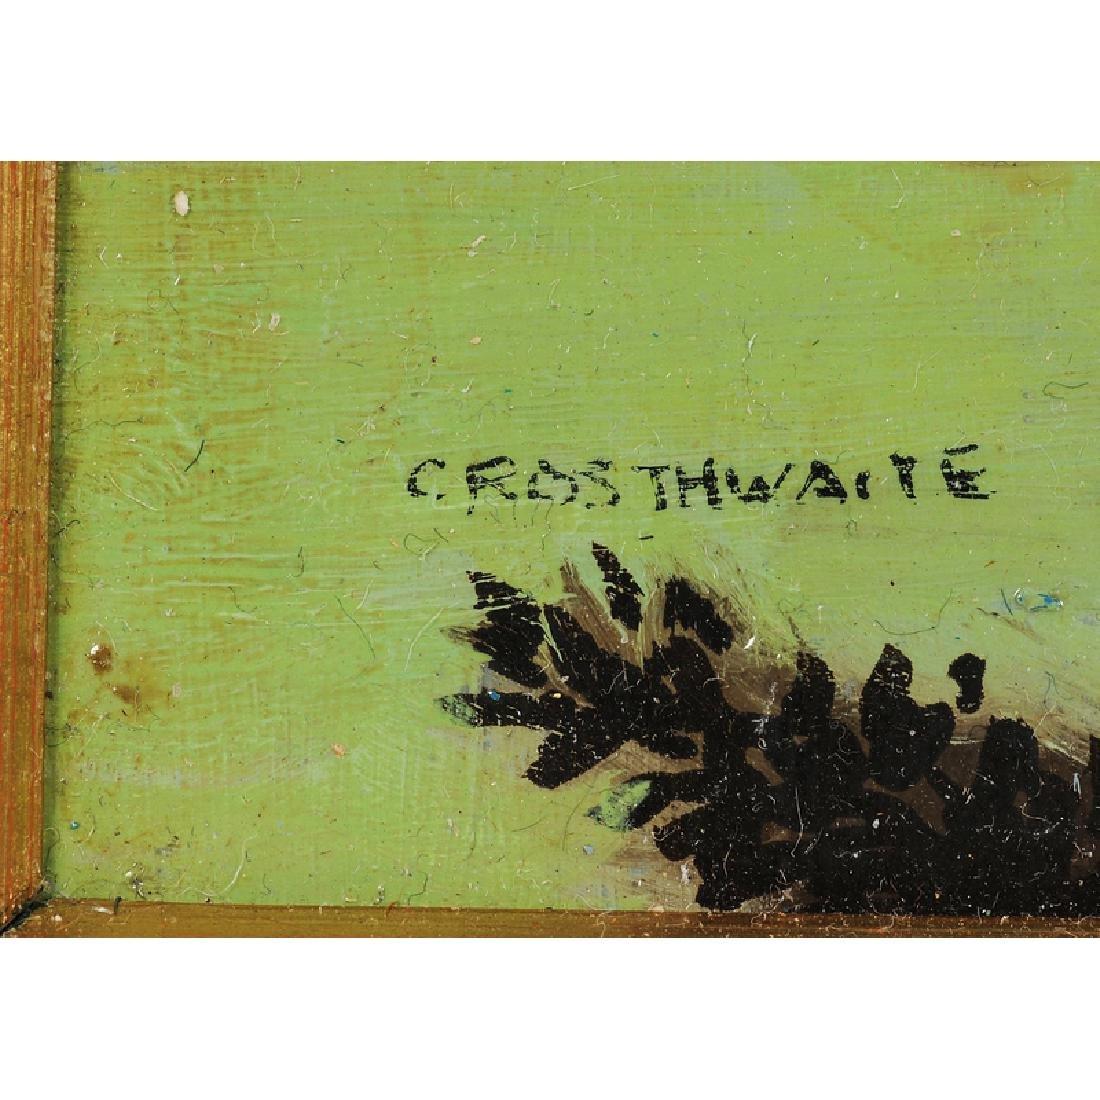 Paul Crosthwaite (American, 20th century) - 2